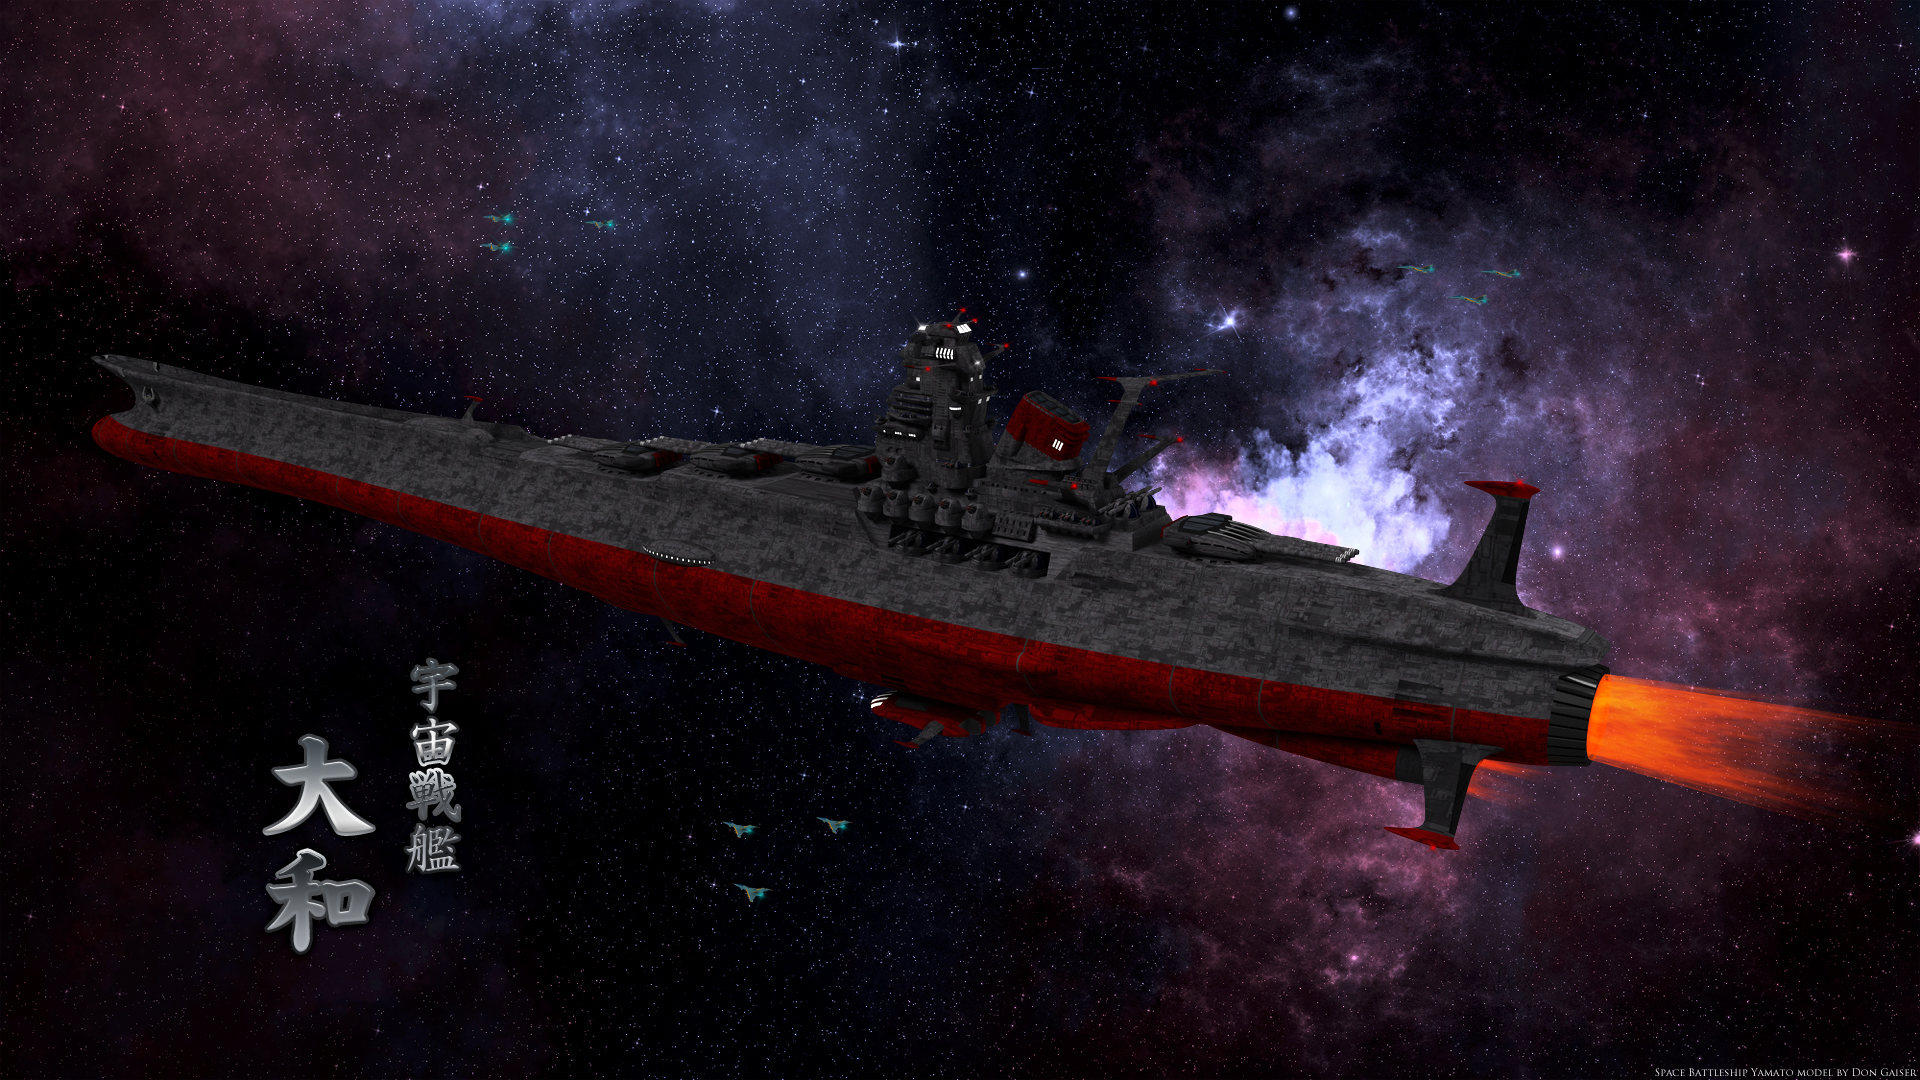 Space battleship yamato by vatorx